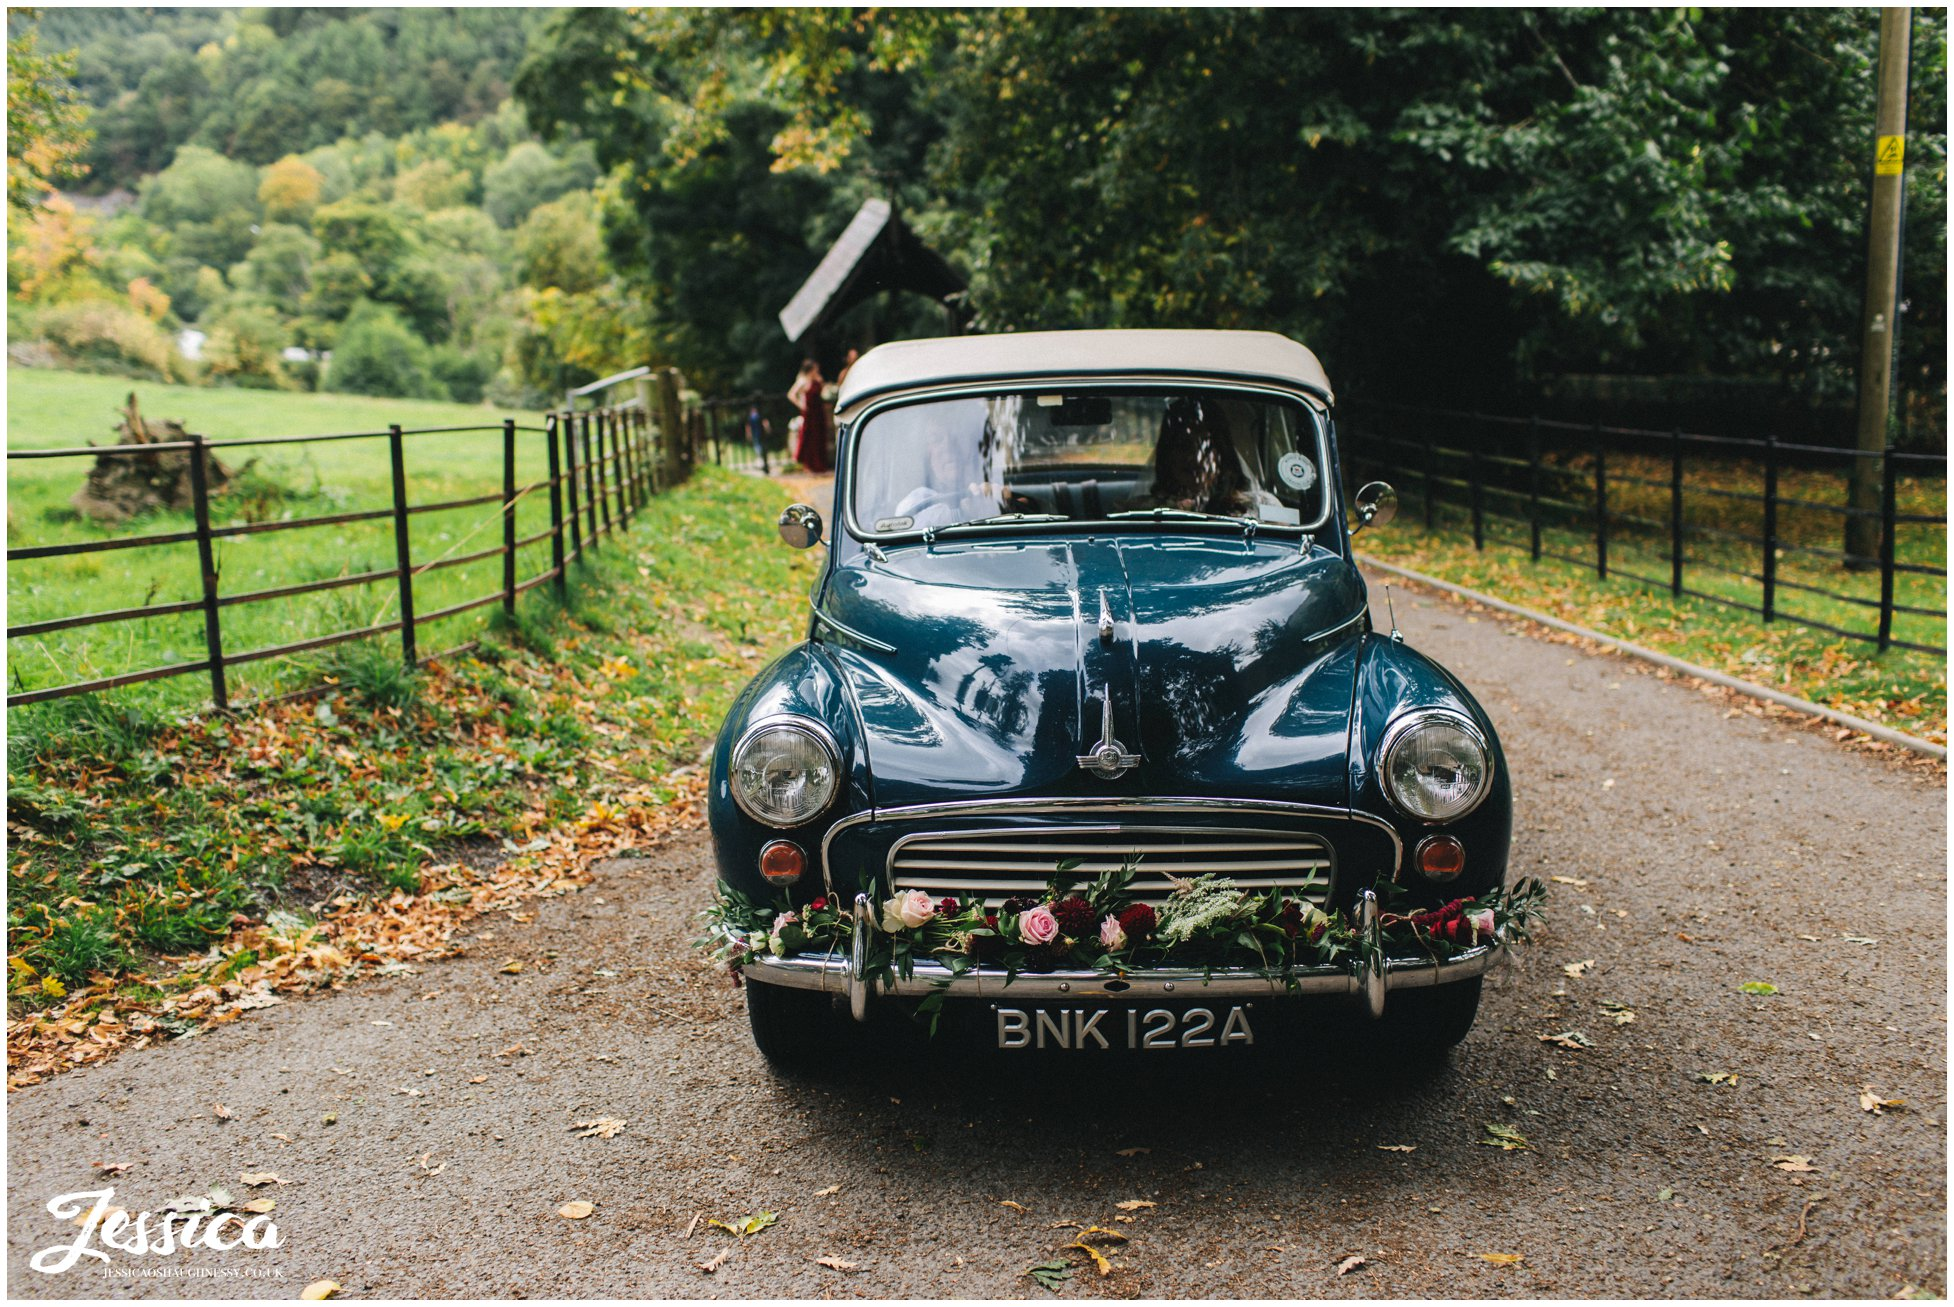 the bride arrives in a vintage car